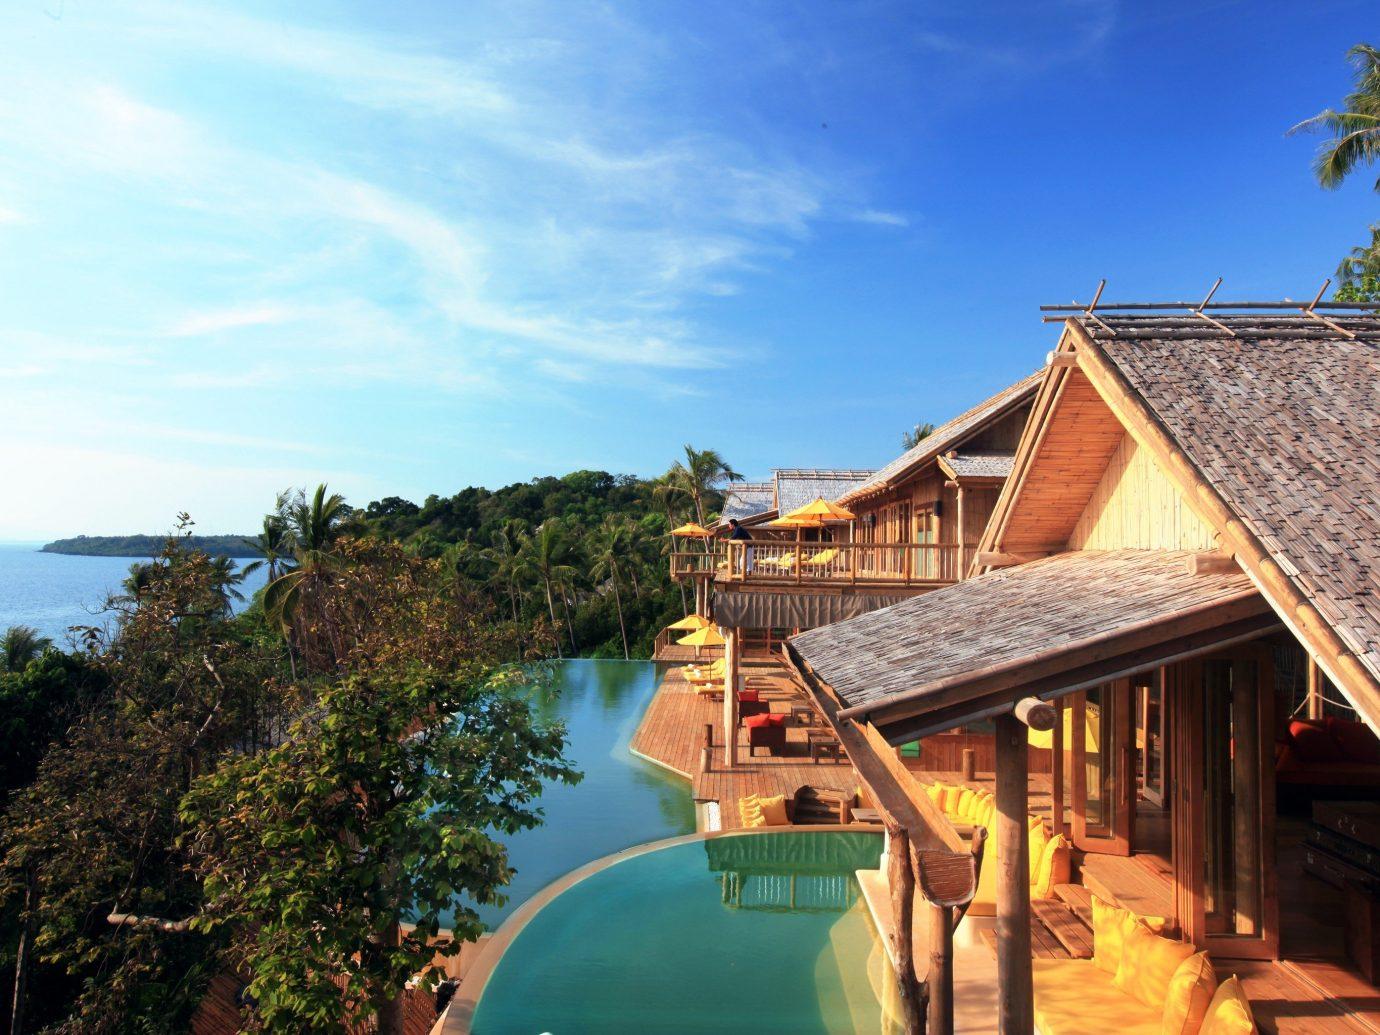 Hotels sky tree outdoor property vacation building house estate Sea Resort tourism Coast Villa Village bay